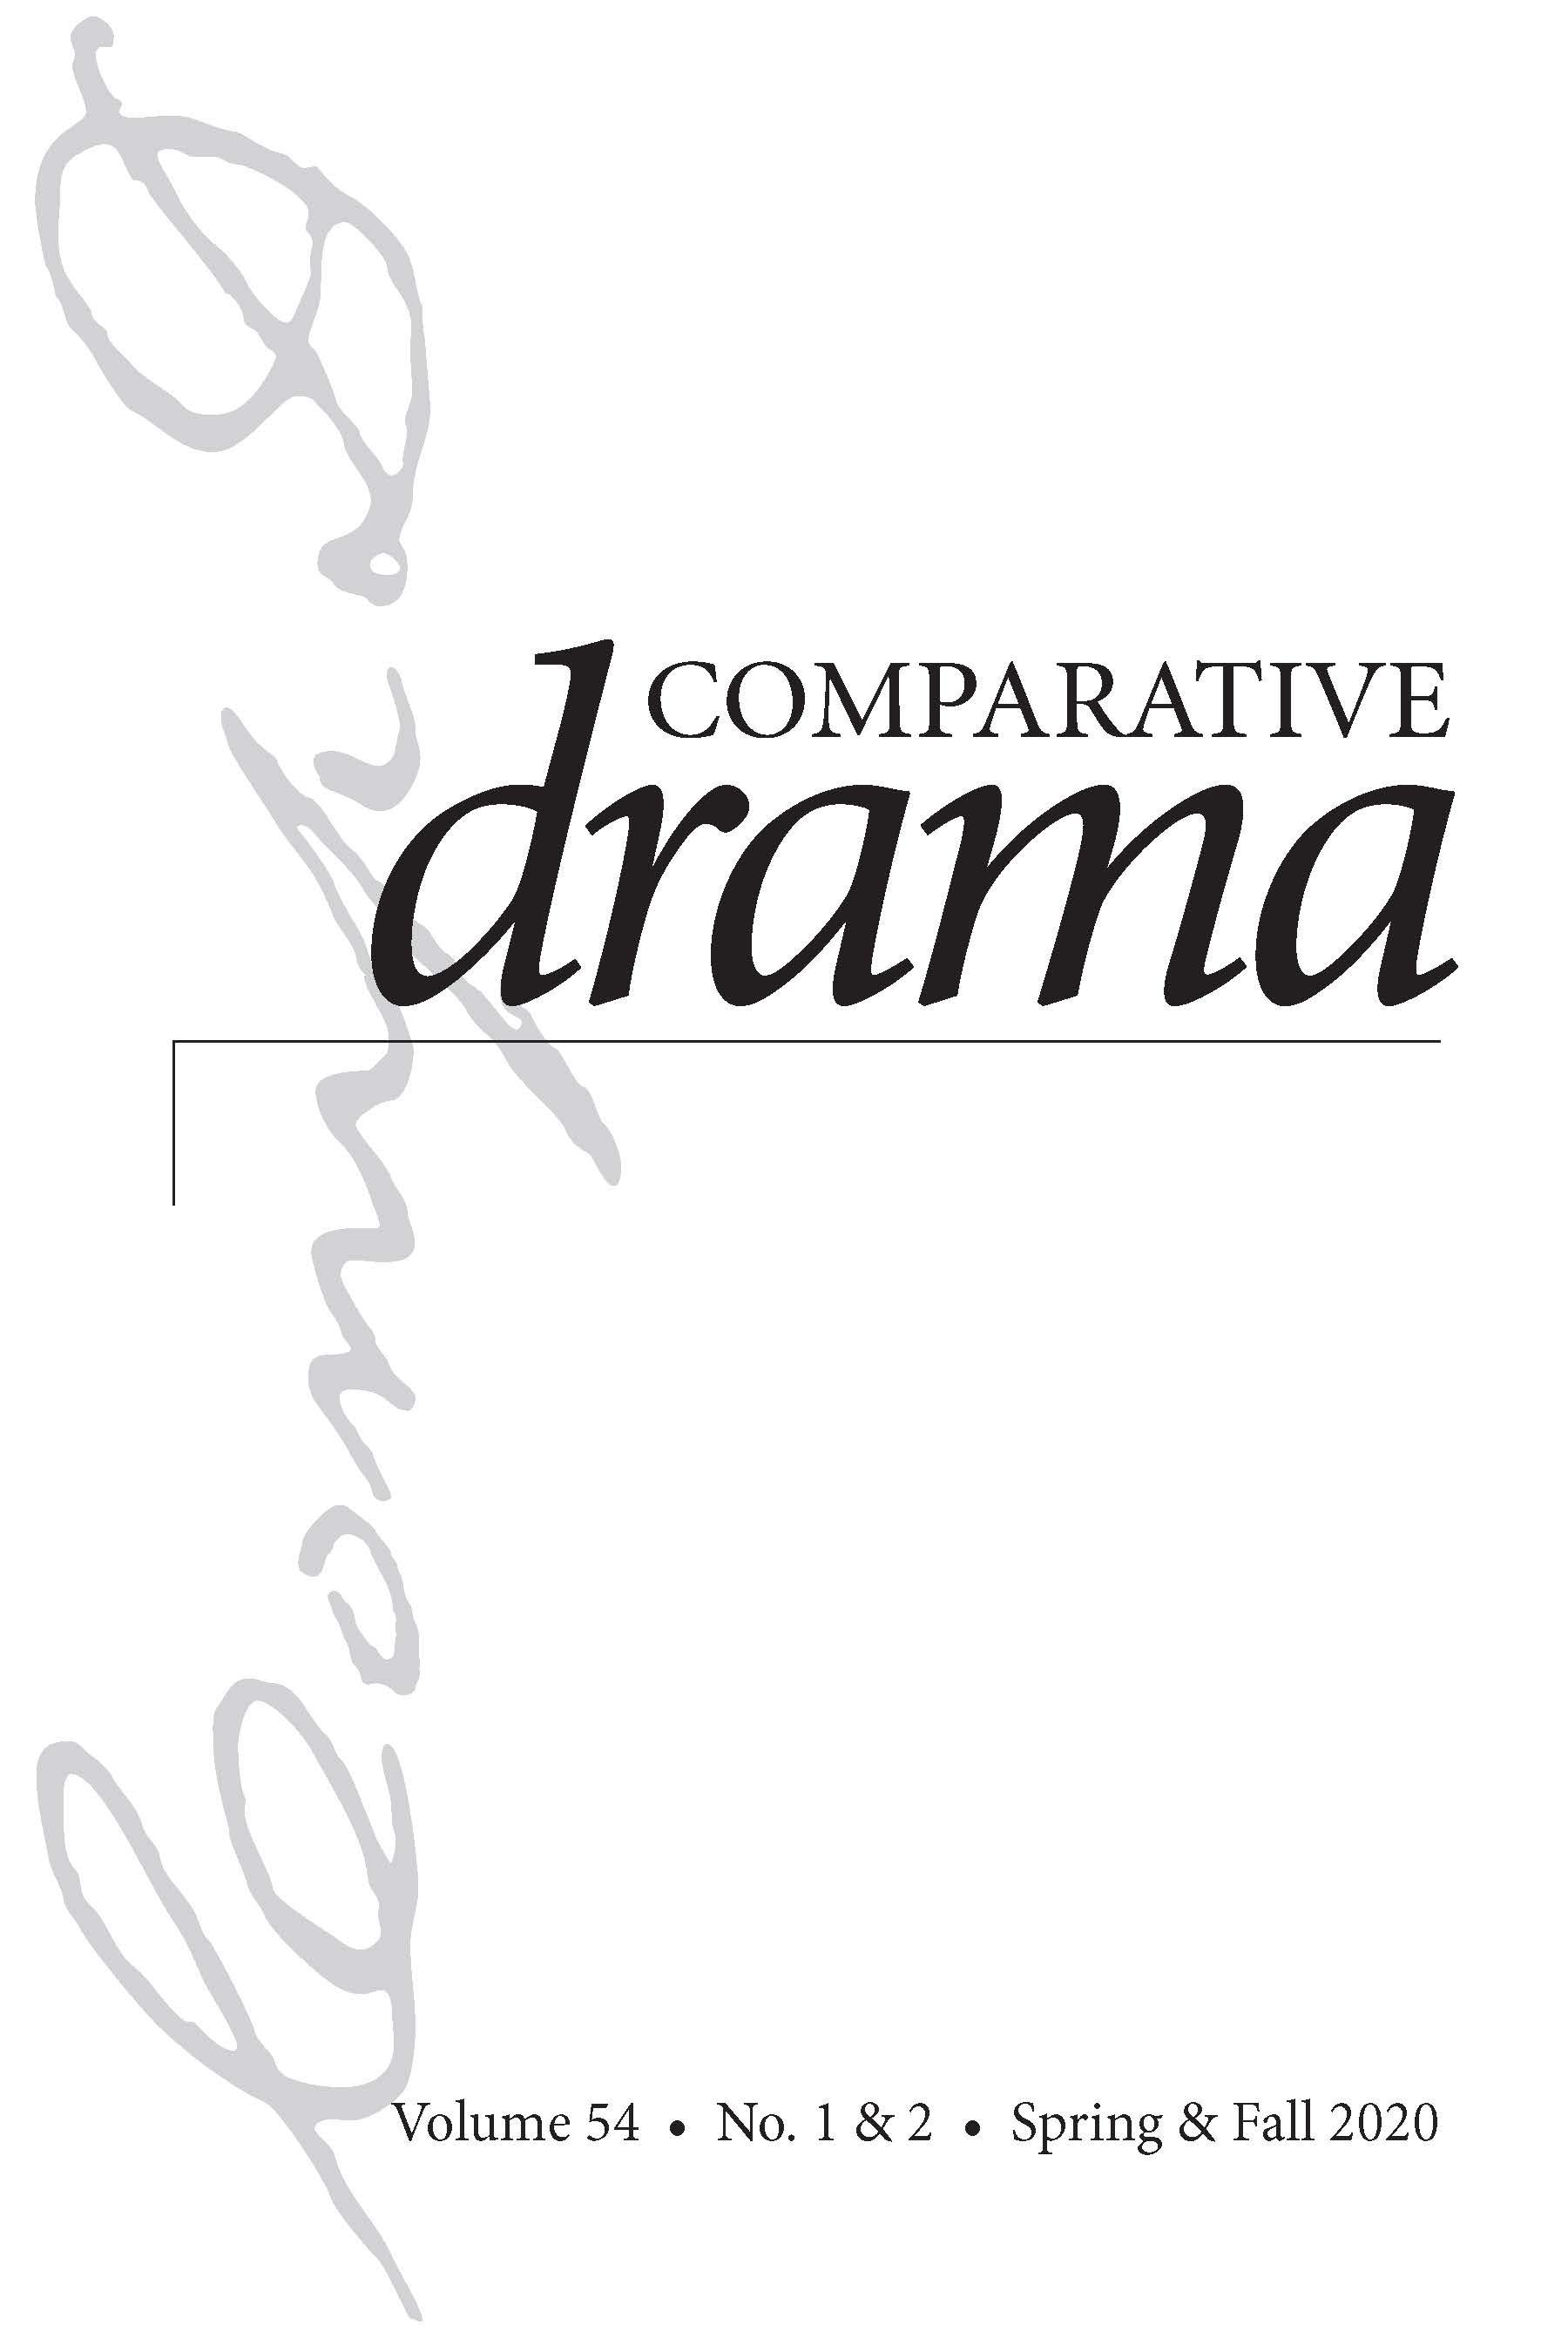 Comparative Drama: Volume 54, Number 1 & 2, Spring & Summer 2020